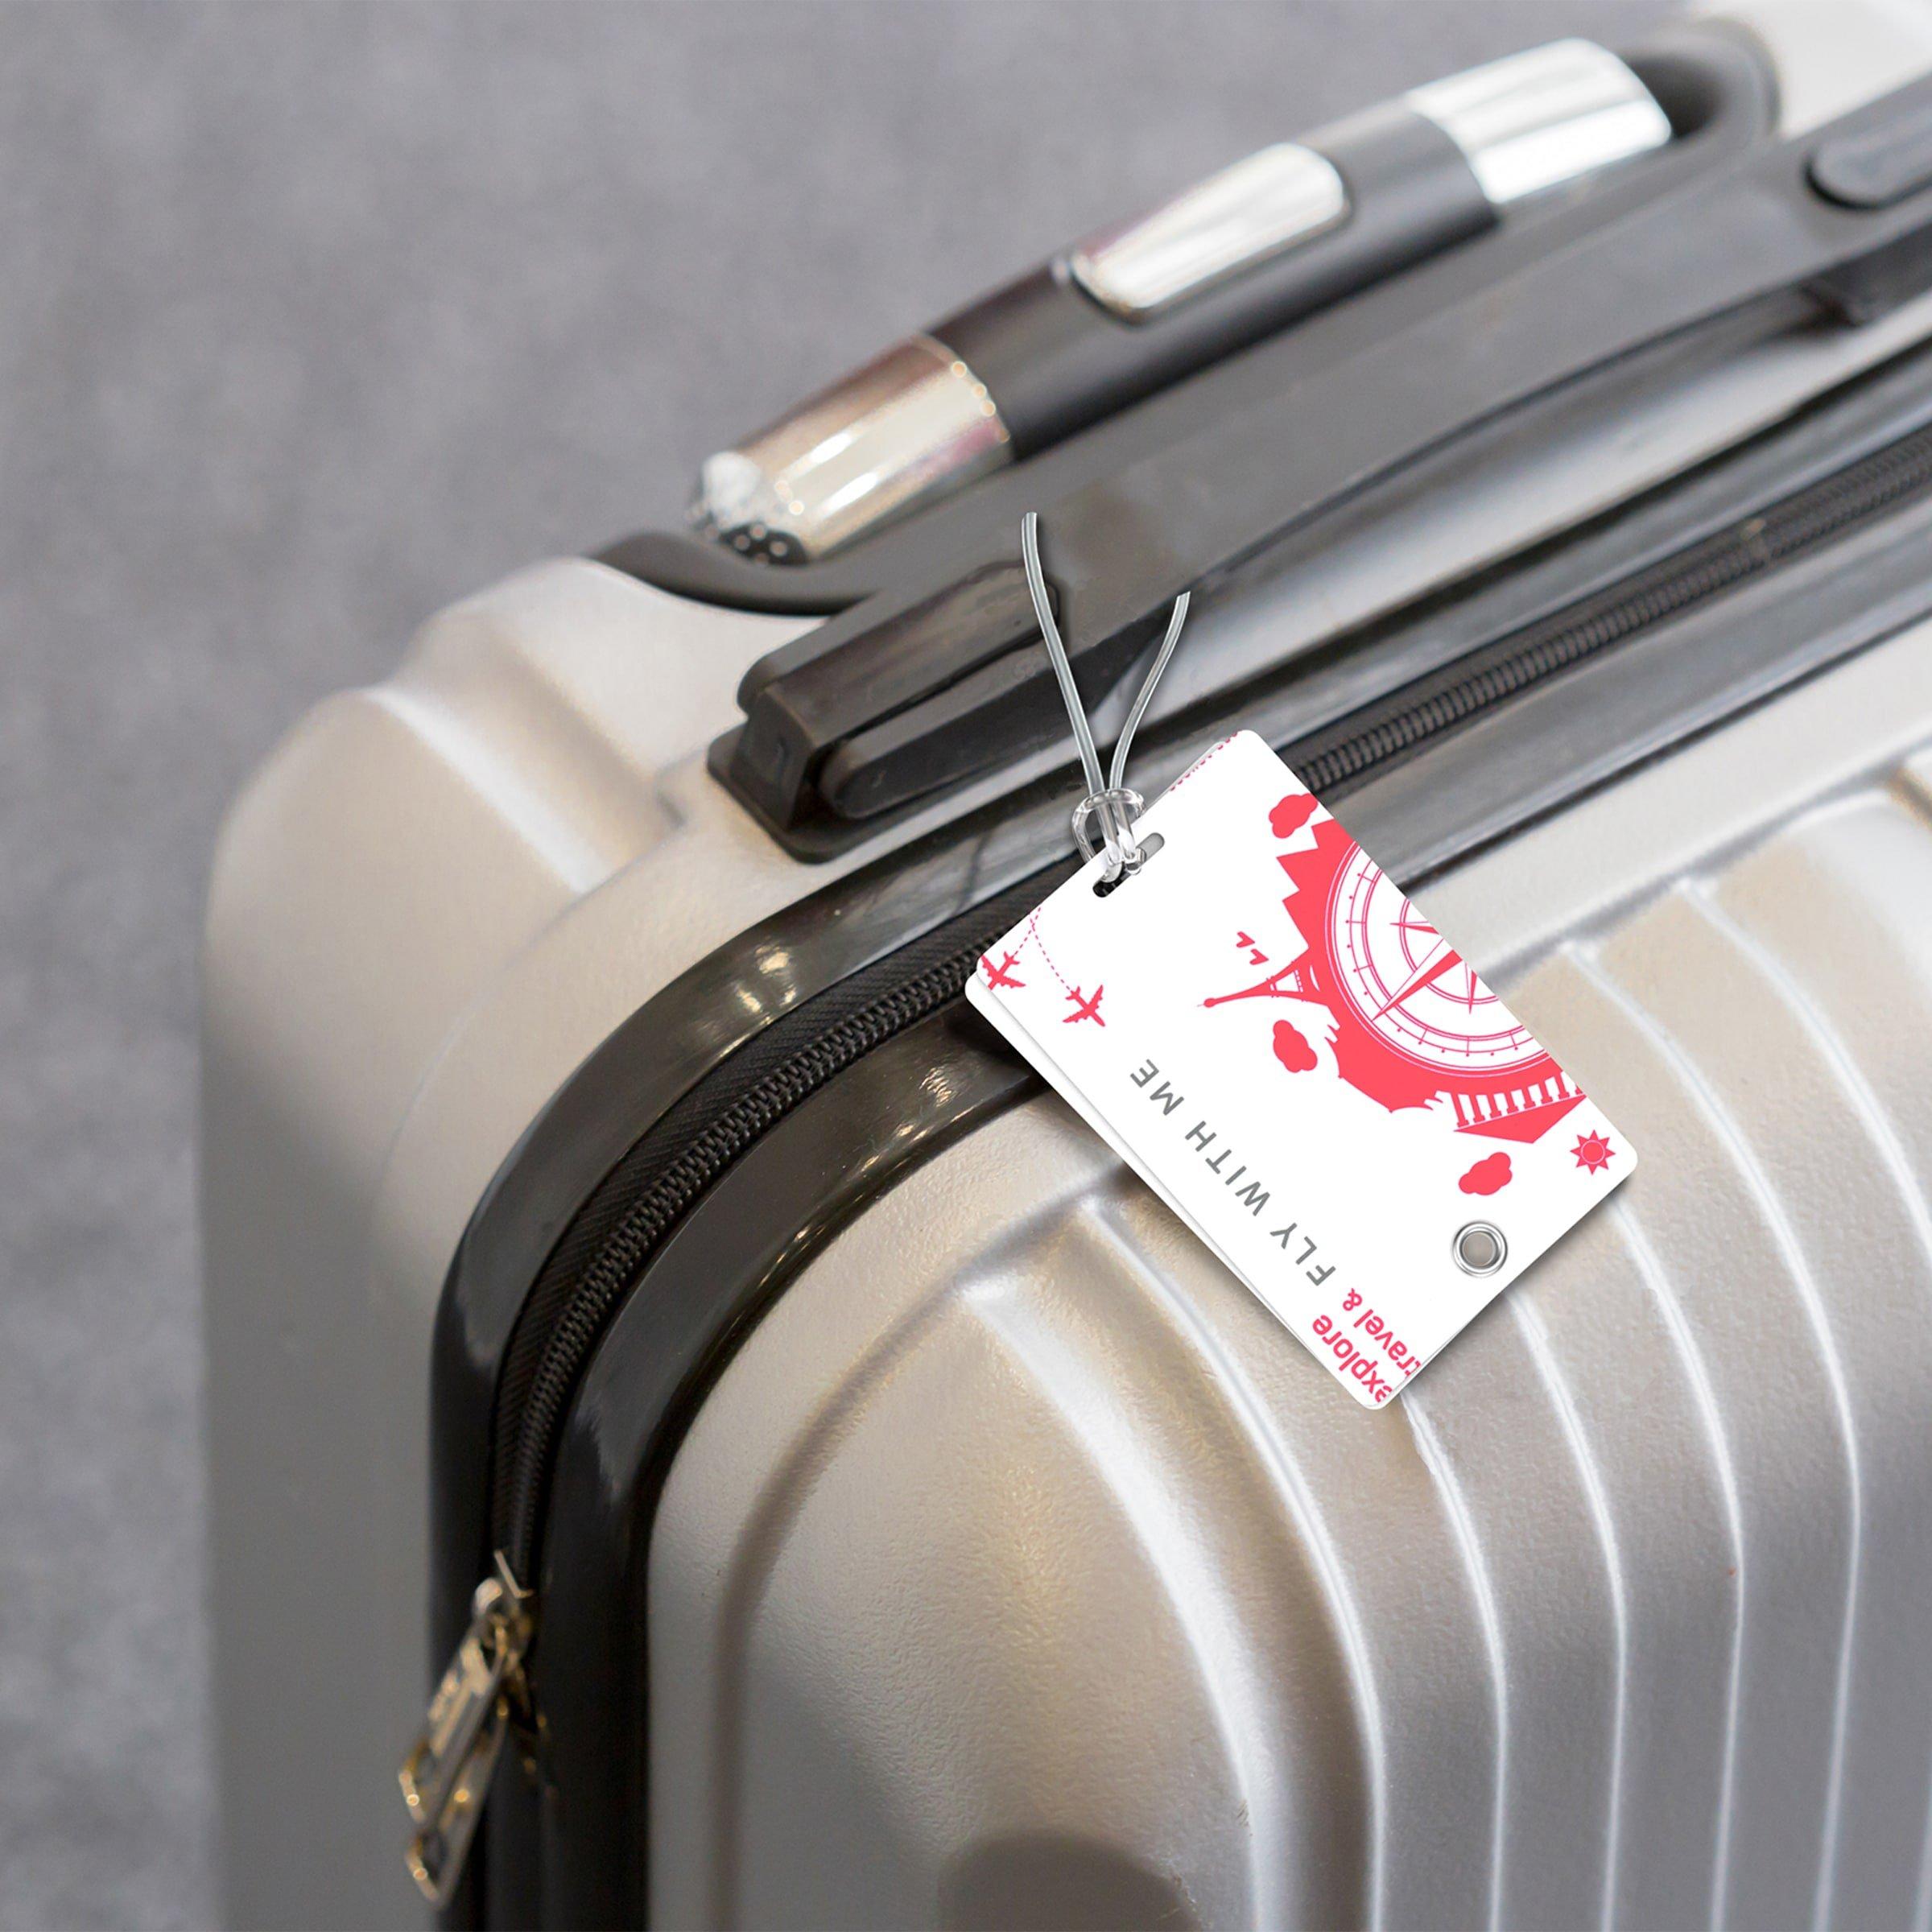 DEO luggage tag